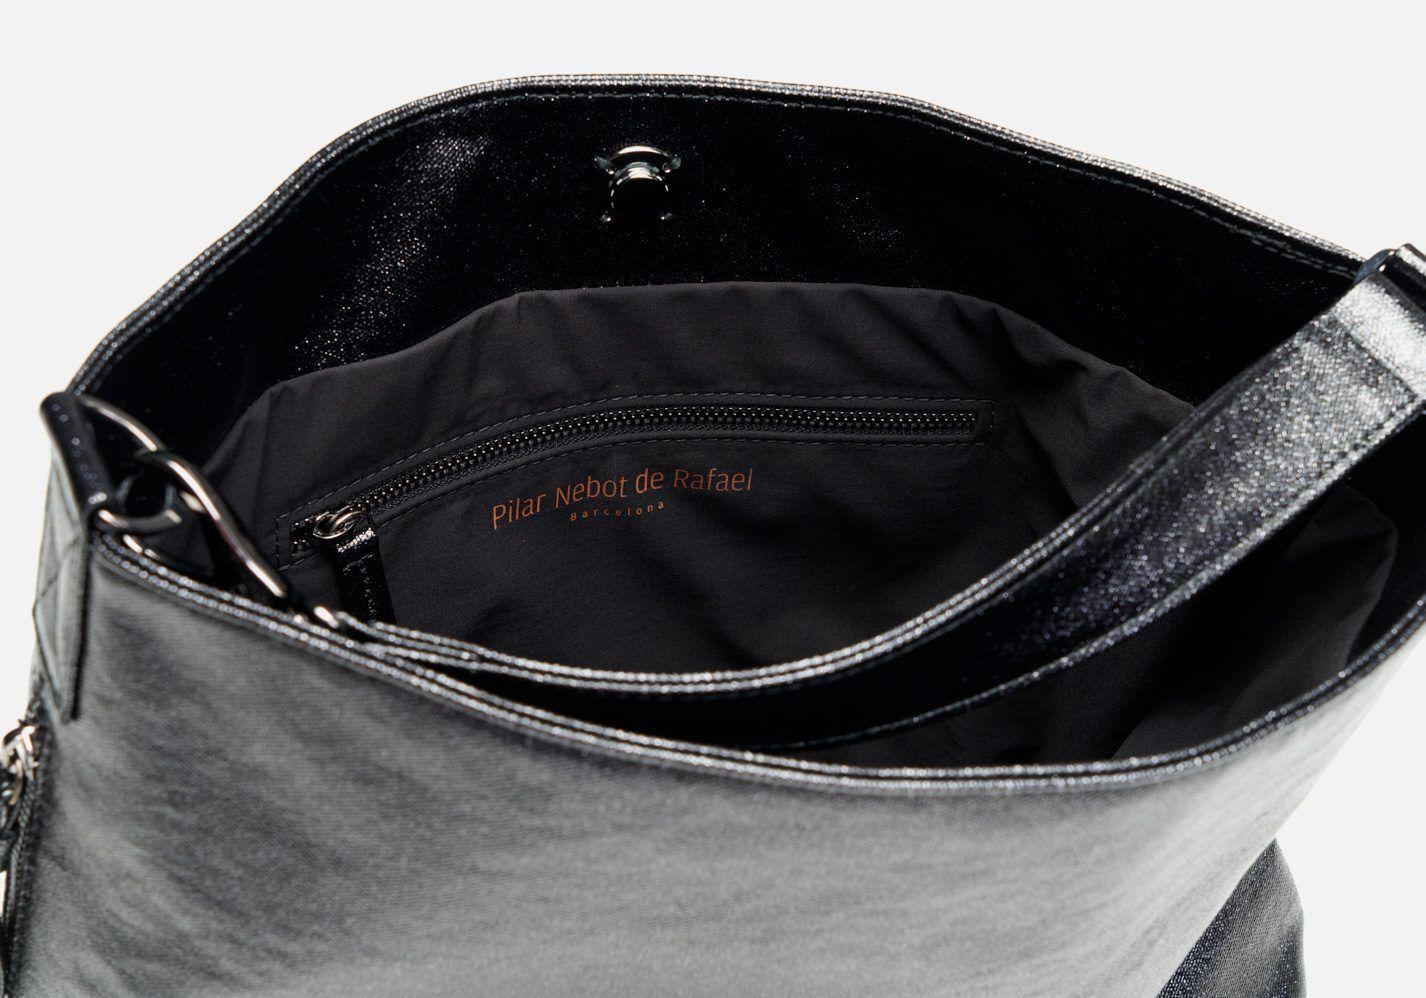 Bolso en tejido laminado con aspecto metalizado – Detalle modelo Beethoven en color negro